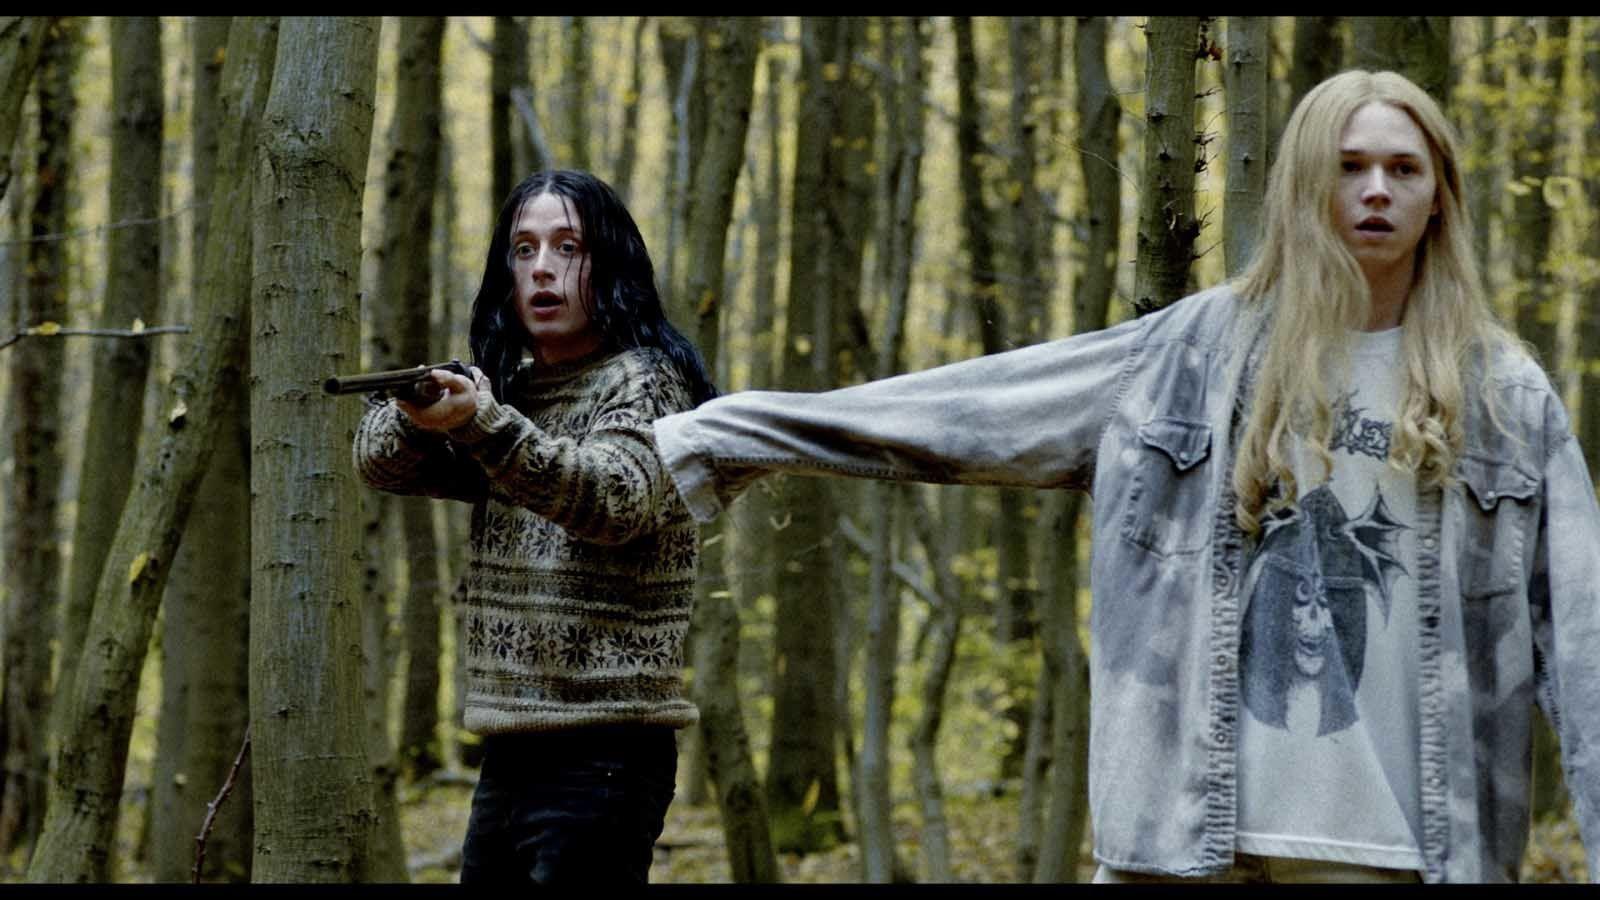 Lords of Chaos (BANDE-ANNONCE) avec Rory Culkin, Emory Cohen, Jack Kilmer - En DVD, Blu-ray et VOD le 21 juin 2019